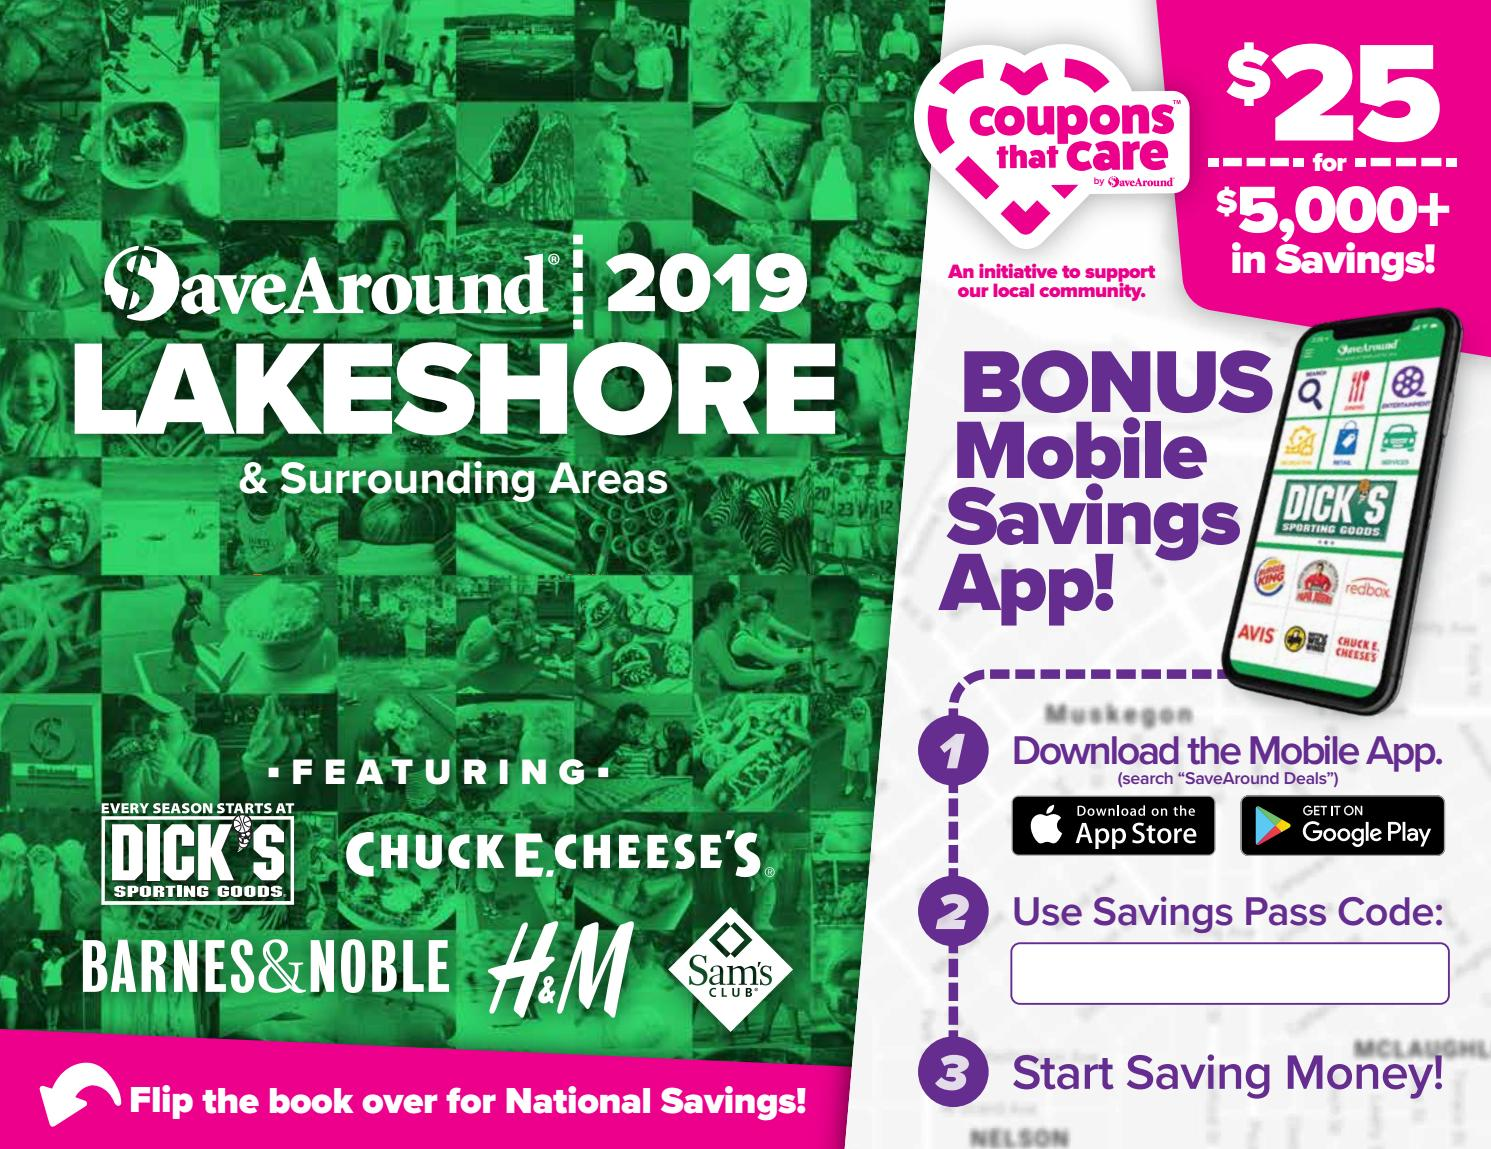 lakeshore coupons january 2019